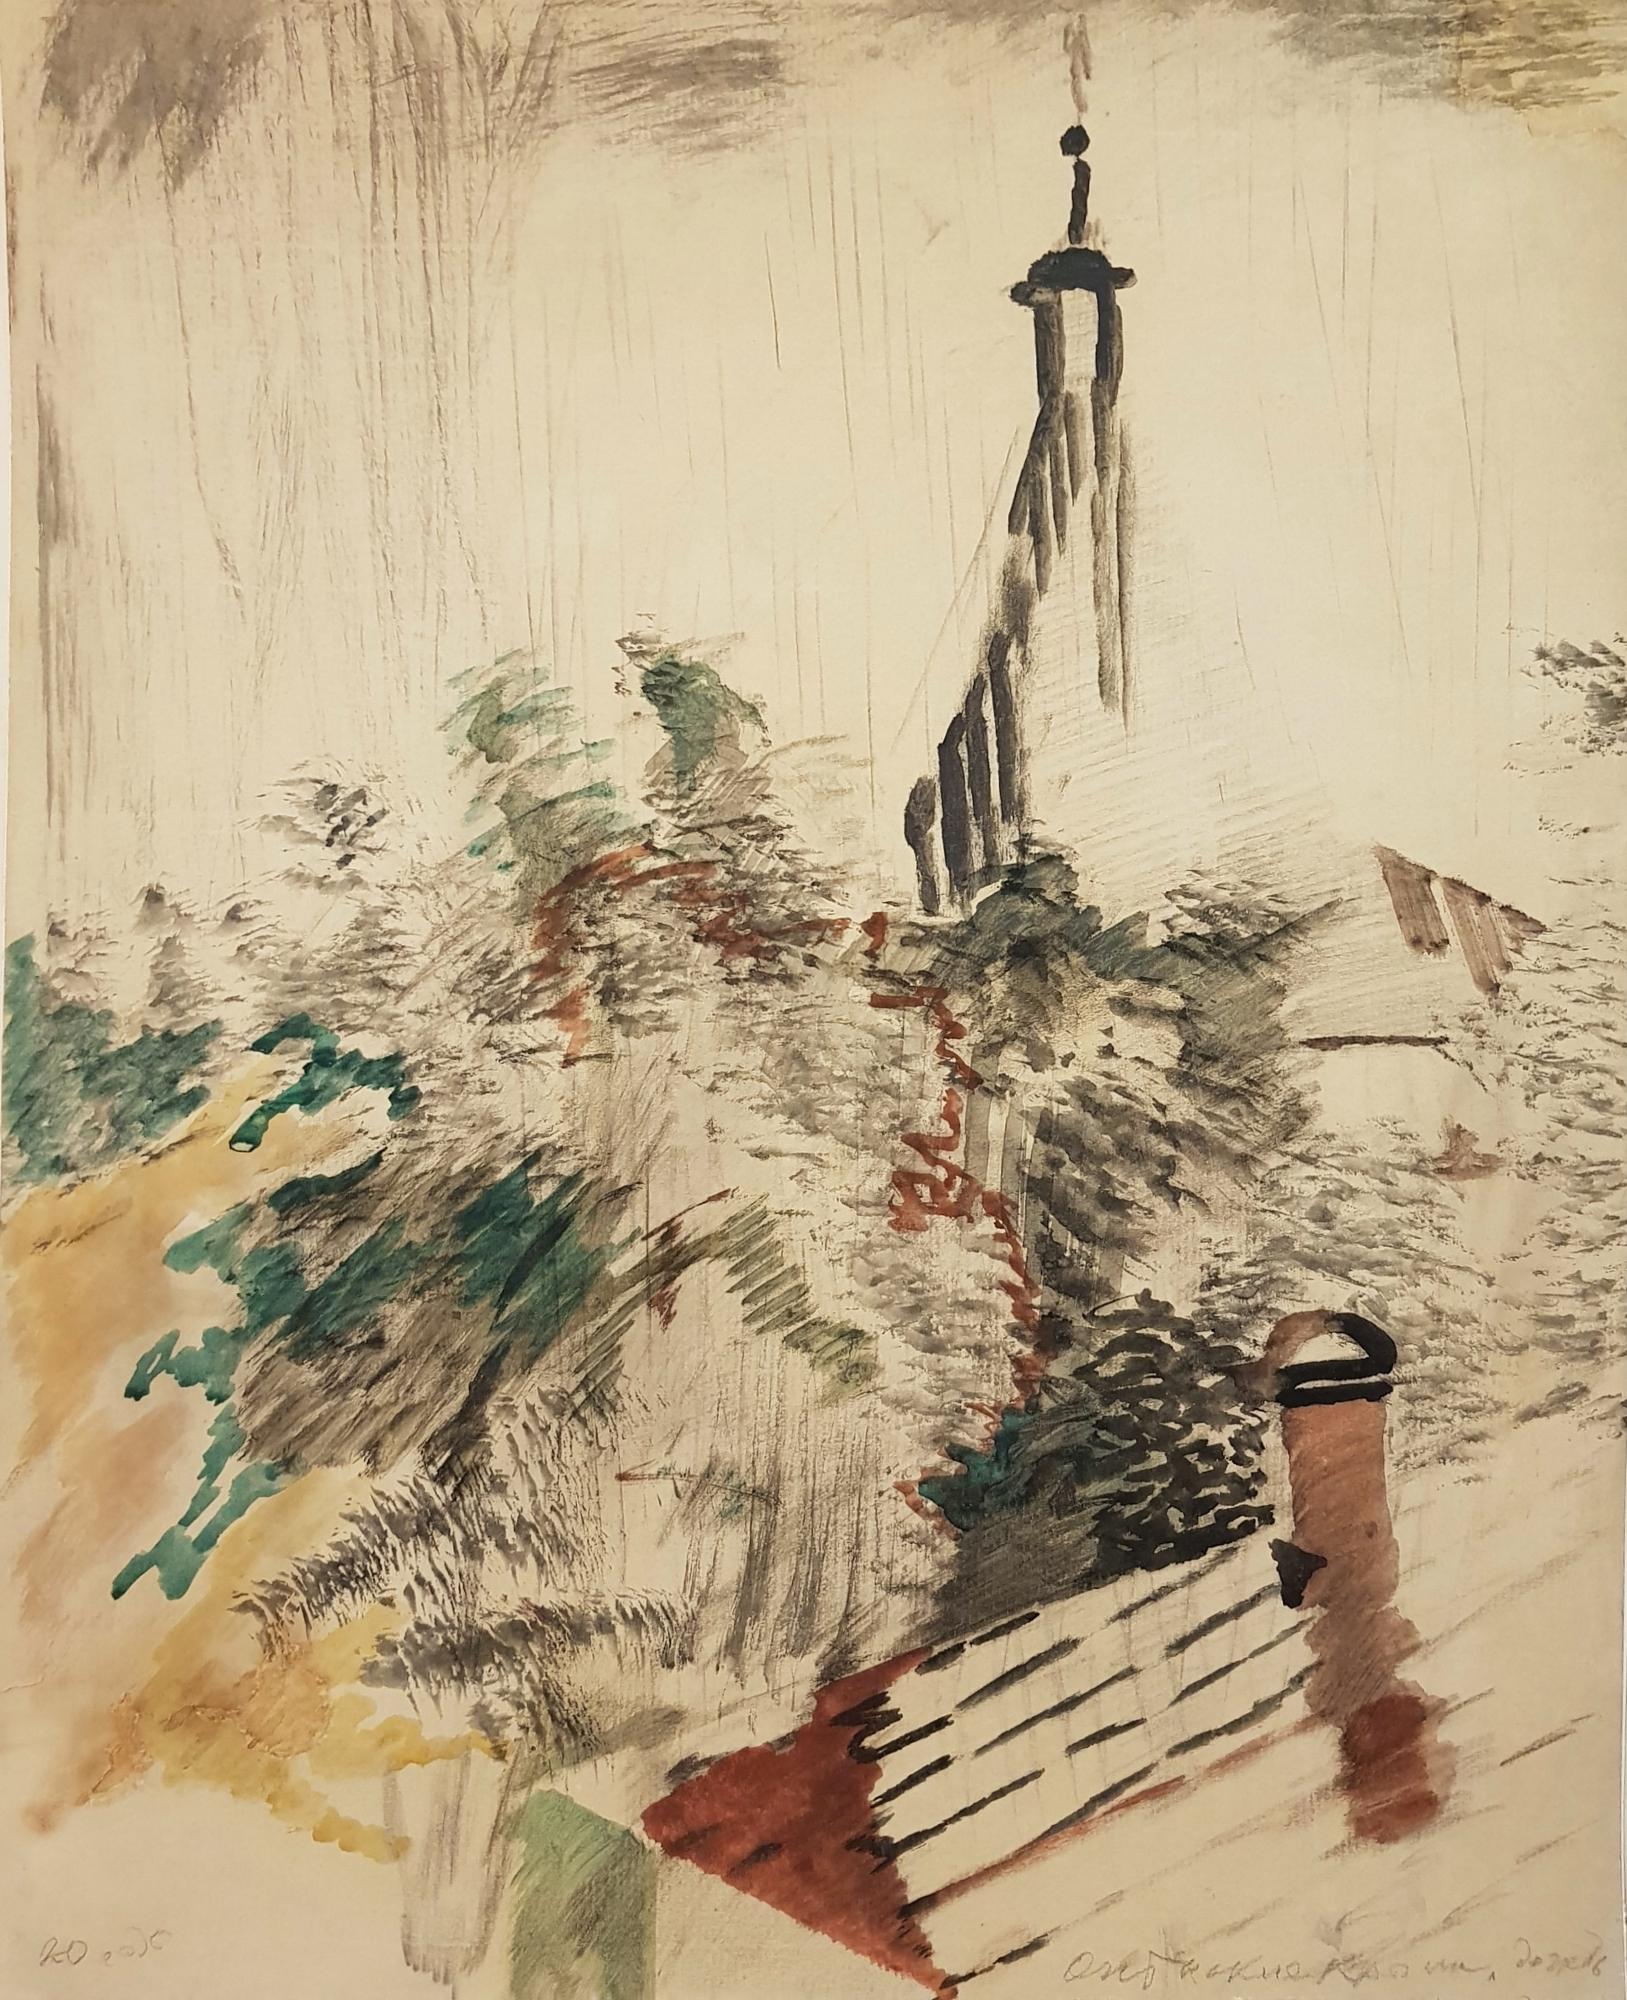 Бруни Лев Александрович. Оптинские крыши. Дождь